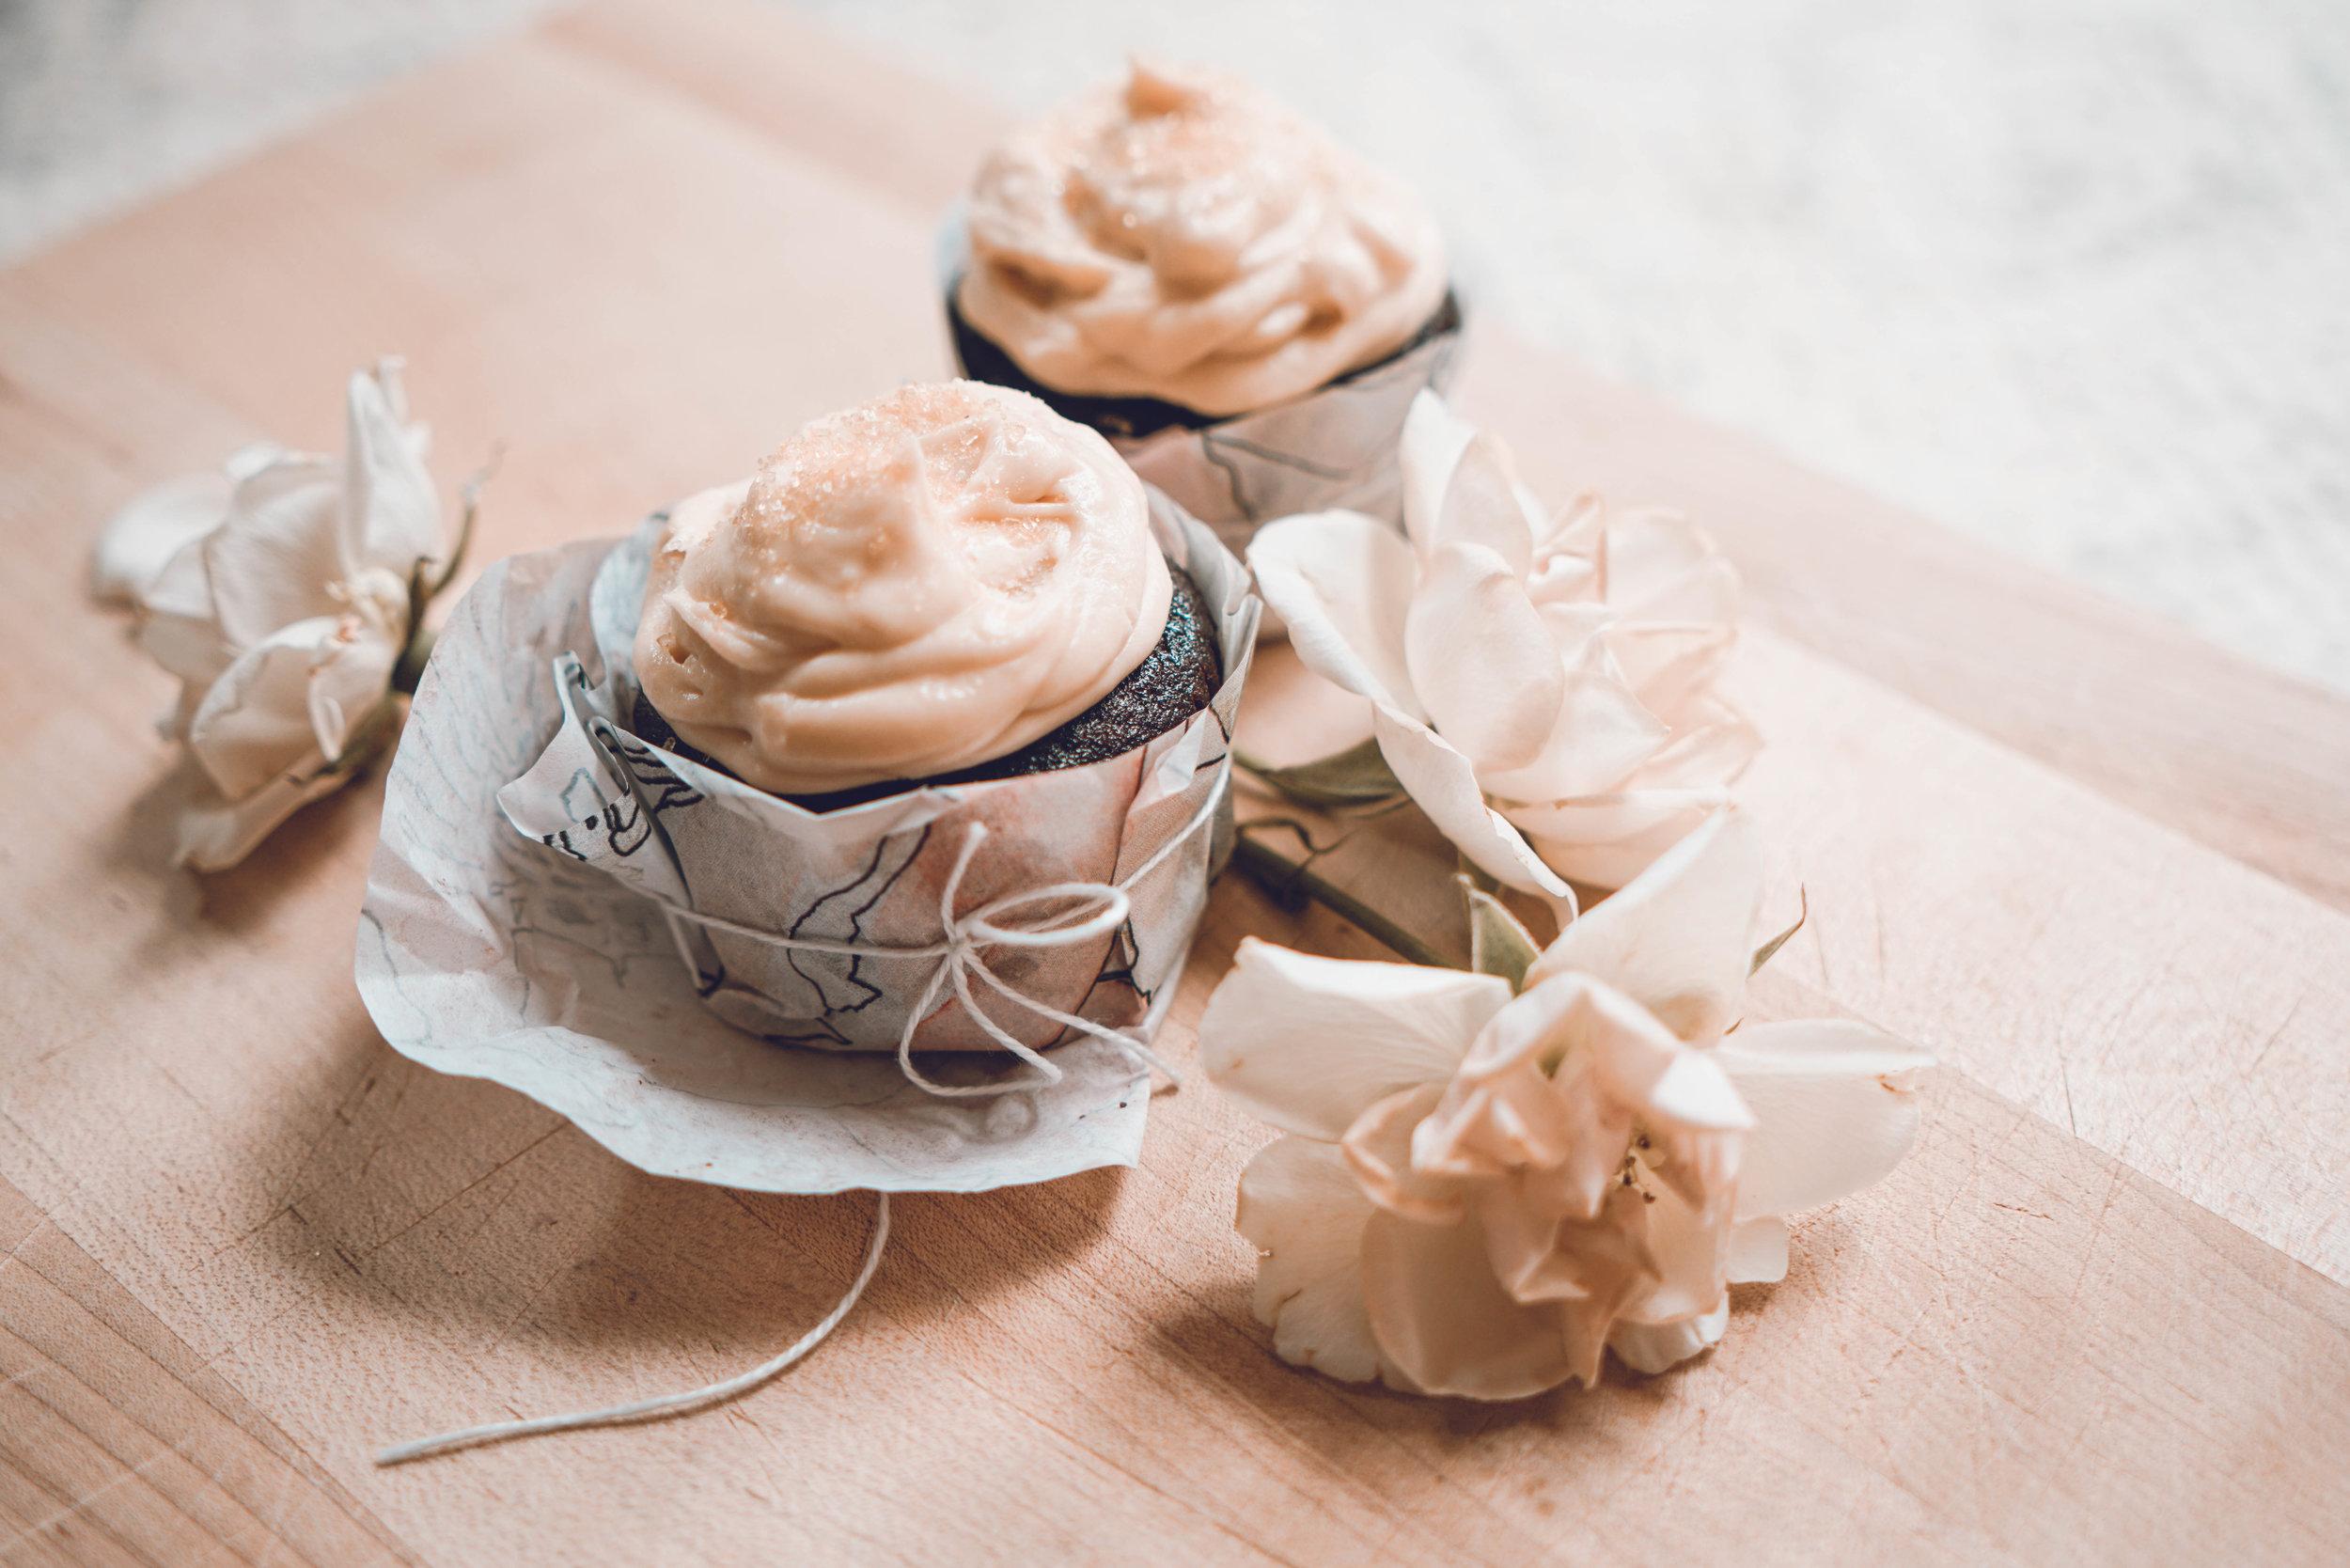 sugaredespressocupcakes-19.jpg